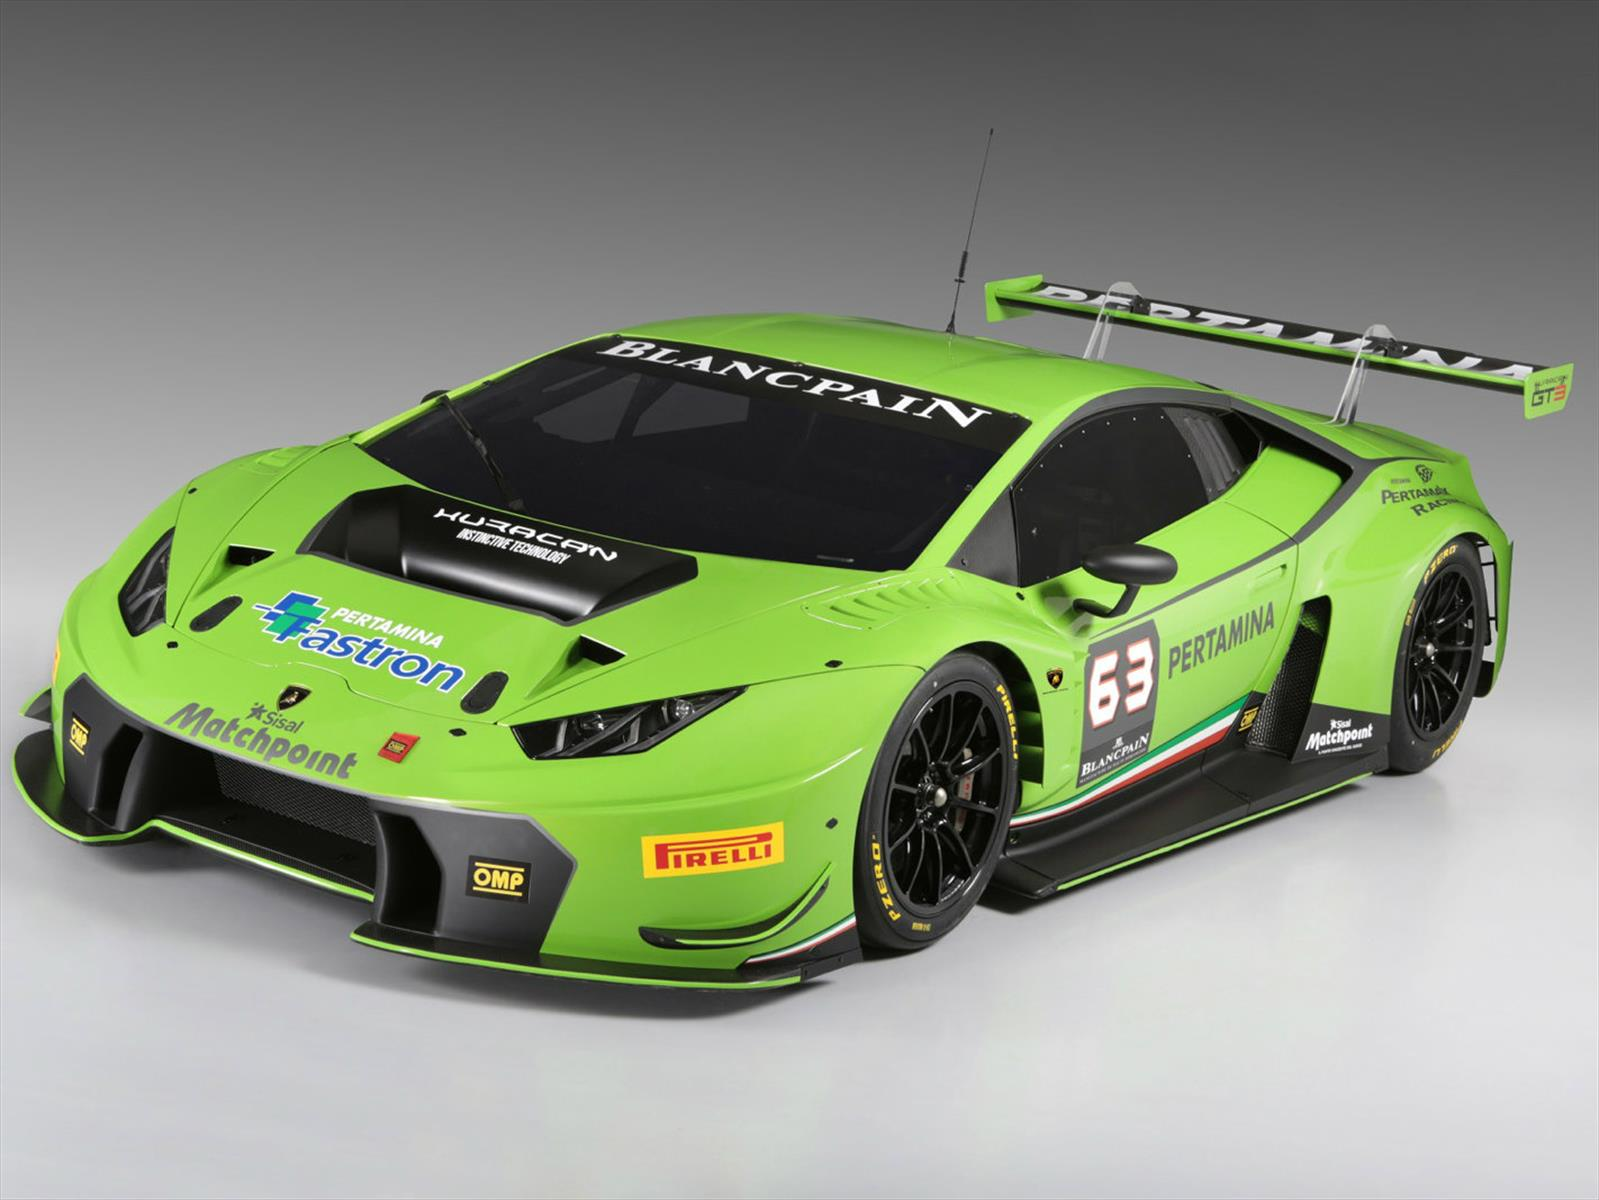 Lamborghini Huracán GT3 listo para competir - Autocosmos.com